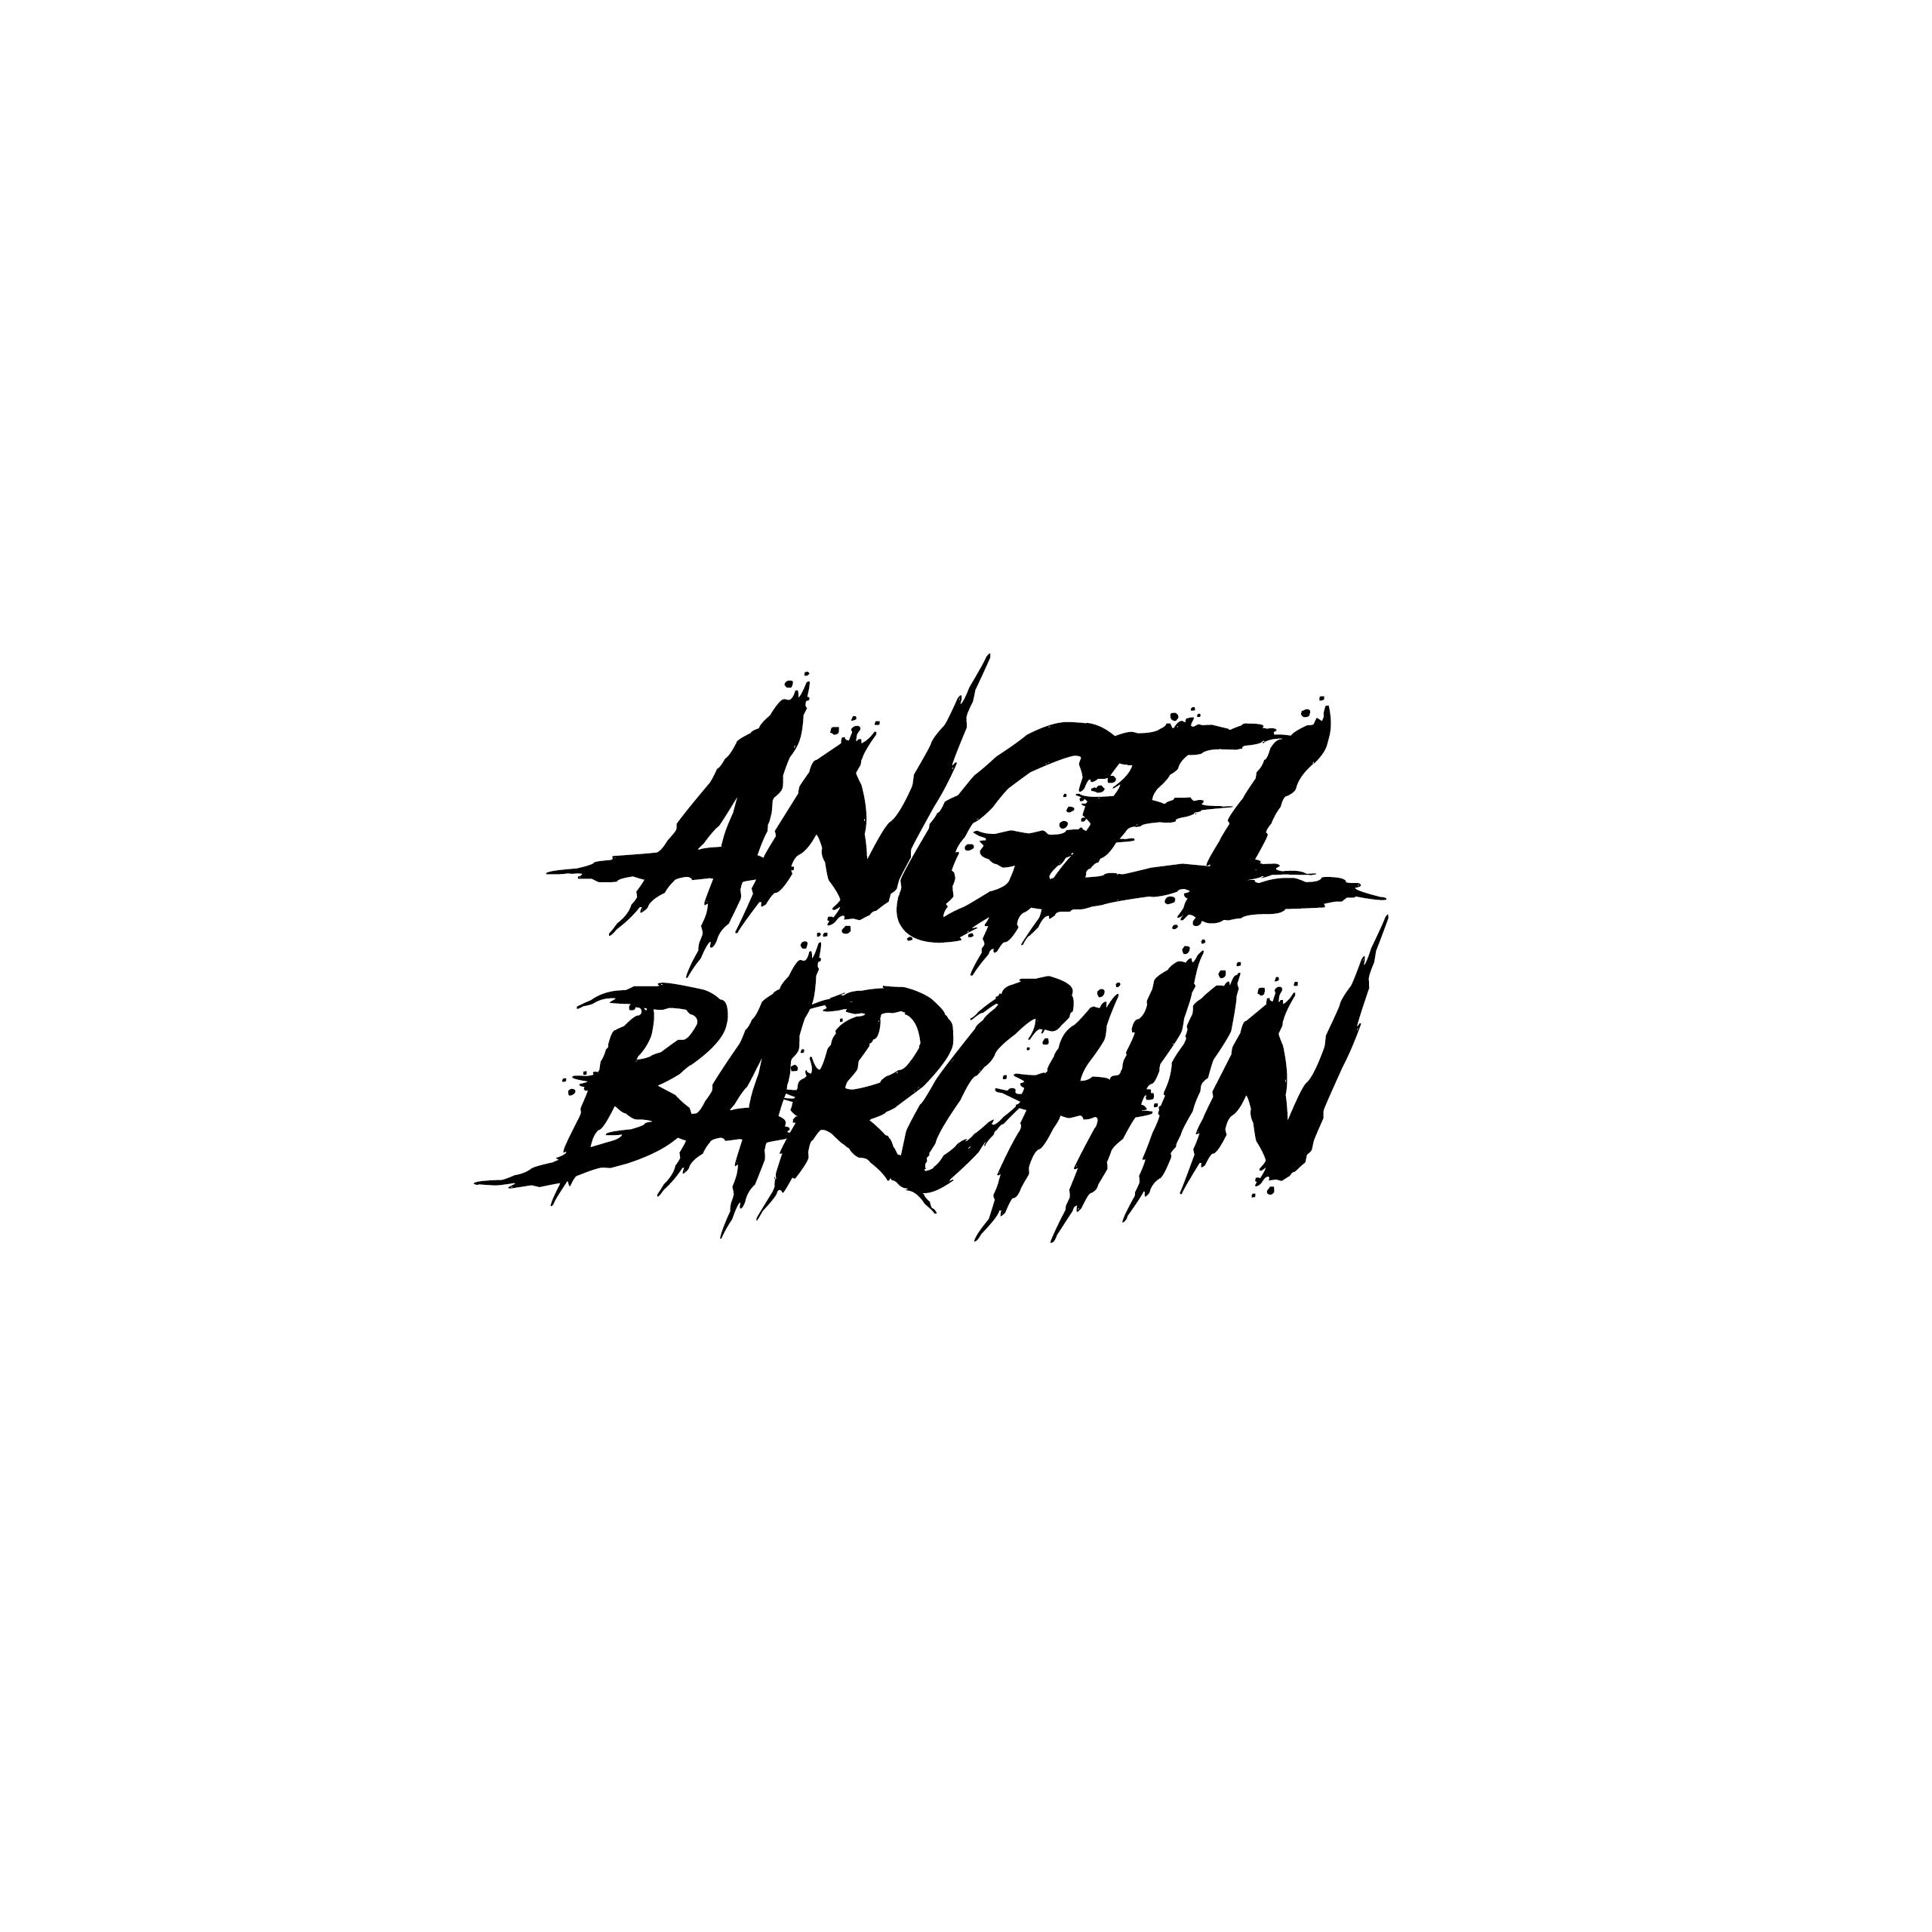 Angel Barchin